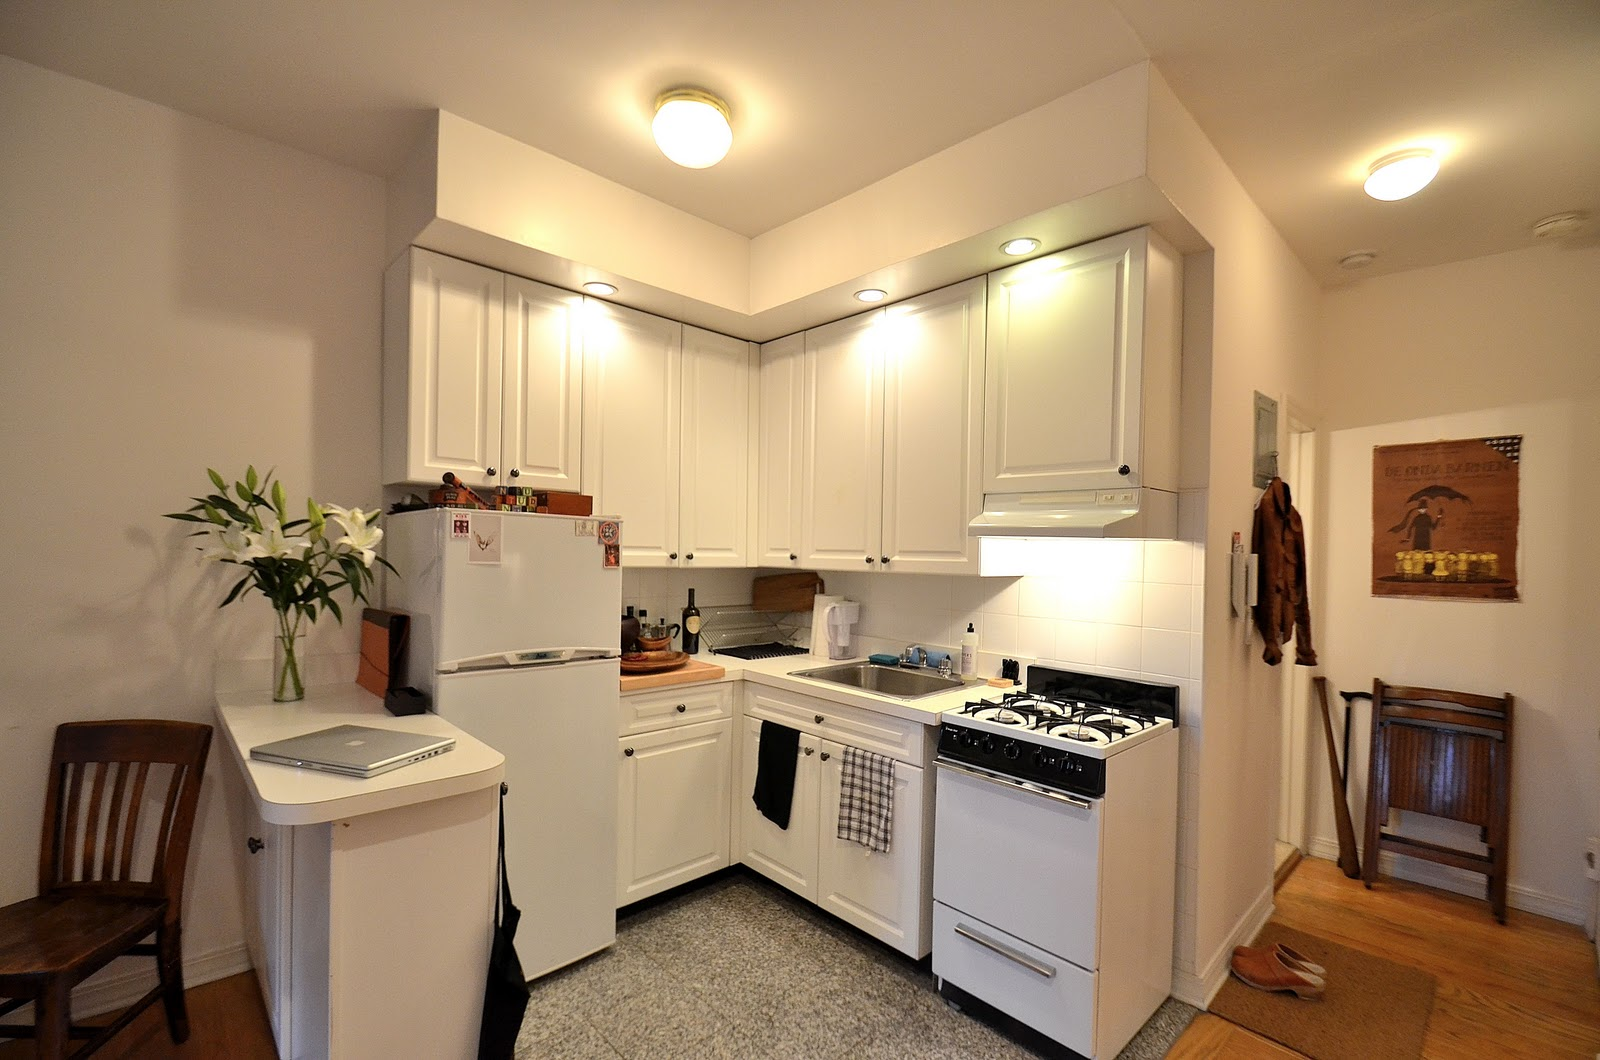 кухни в студию за копейки, недорого на заказ